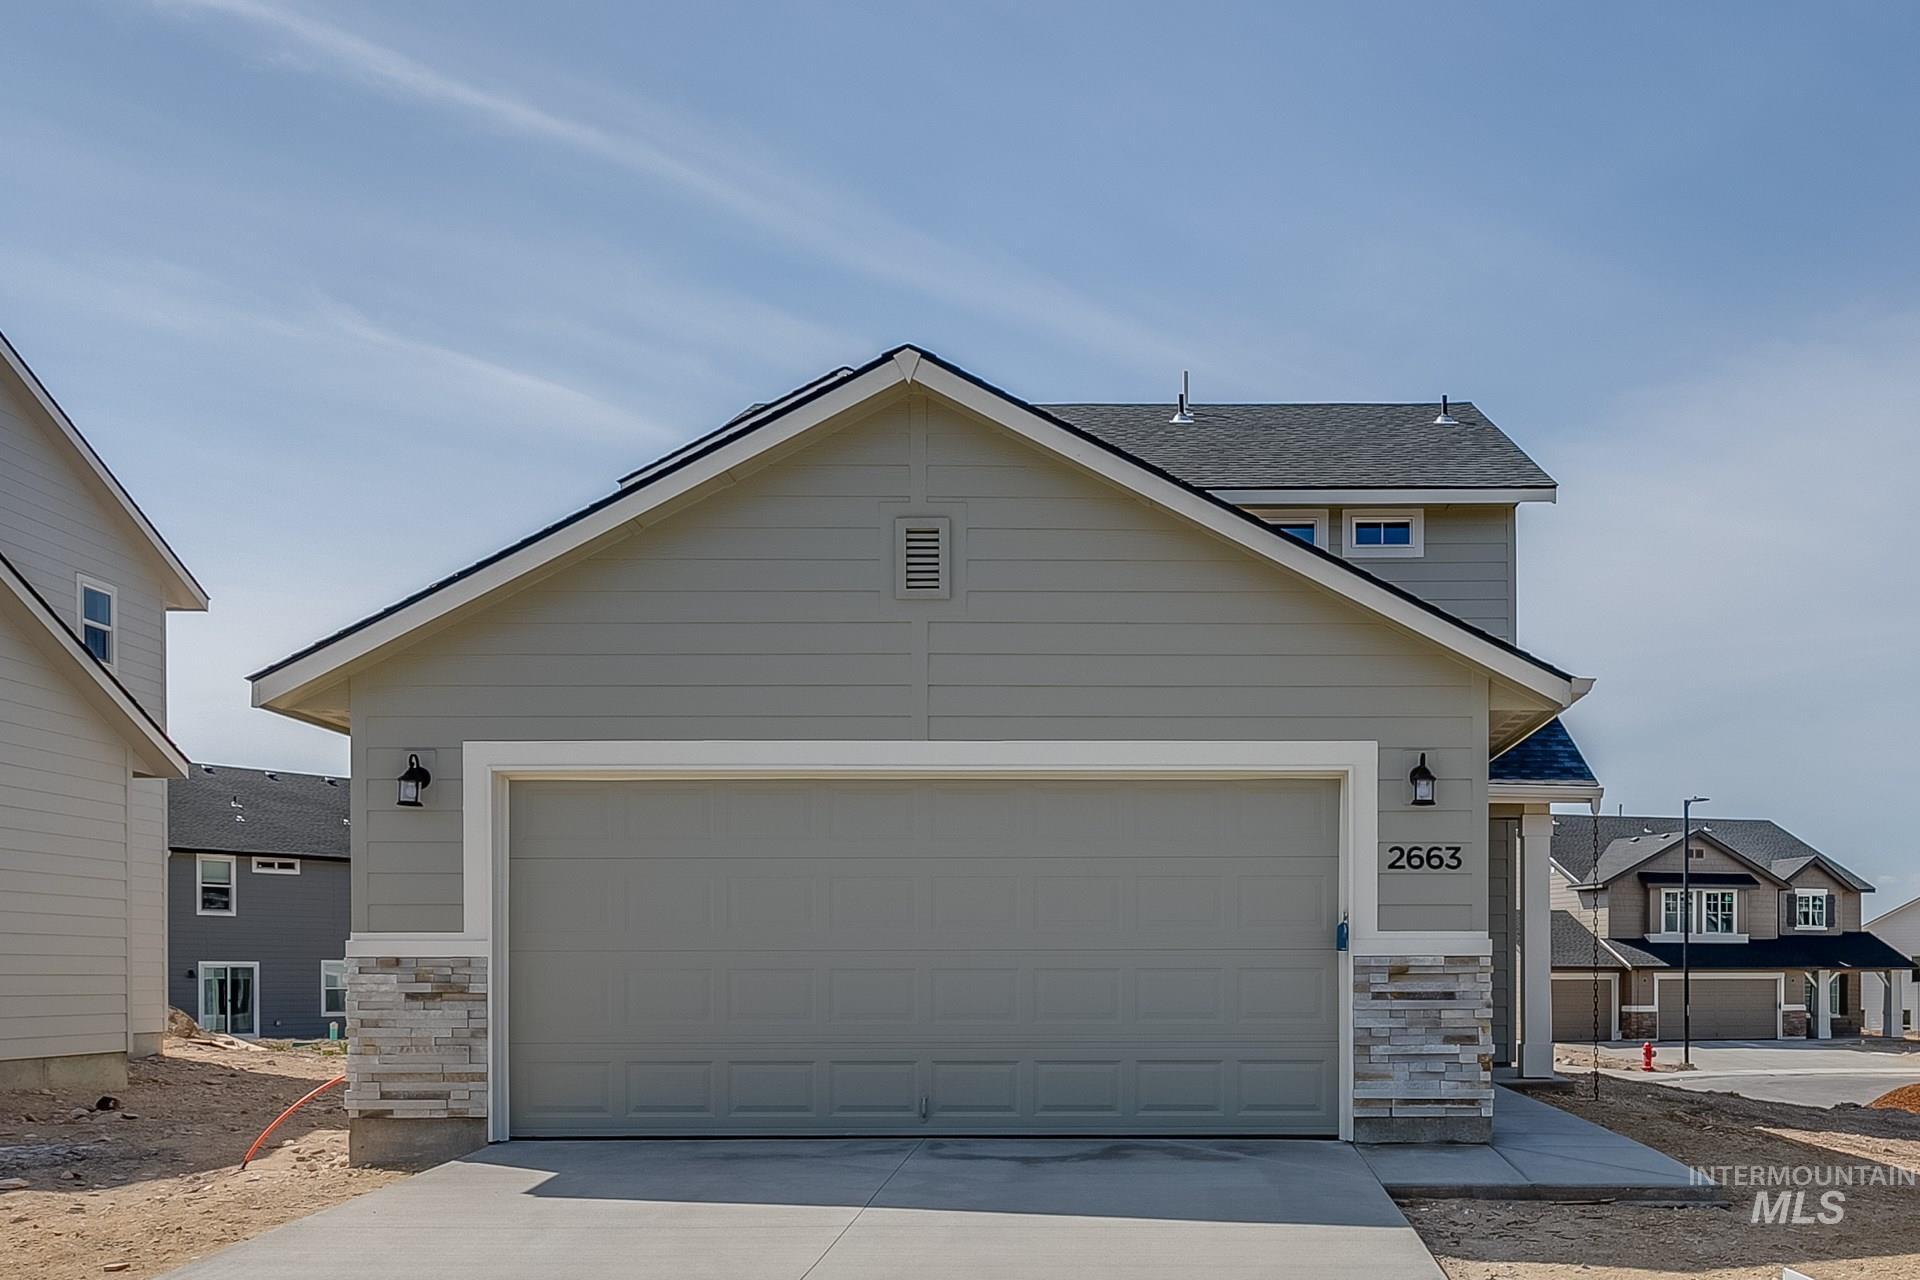 2663 W Balboa Dr Property Photo - Kuna, ID real estate listing